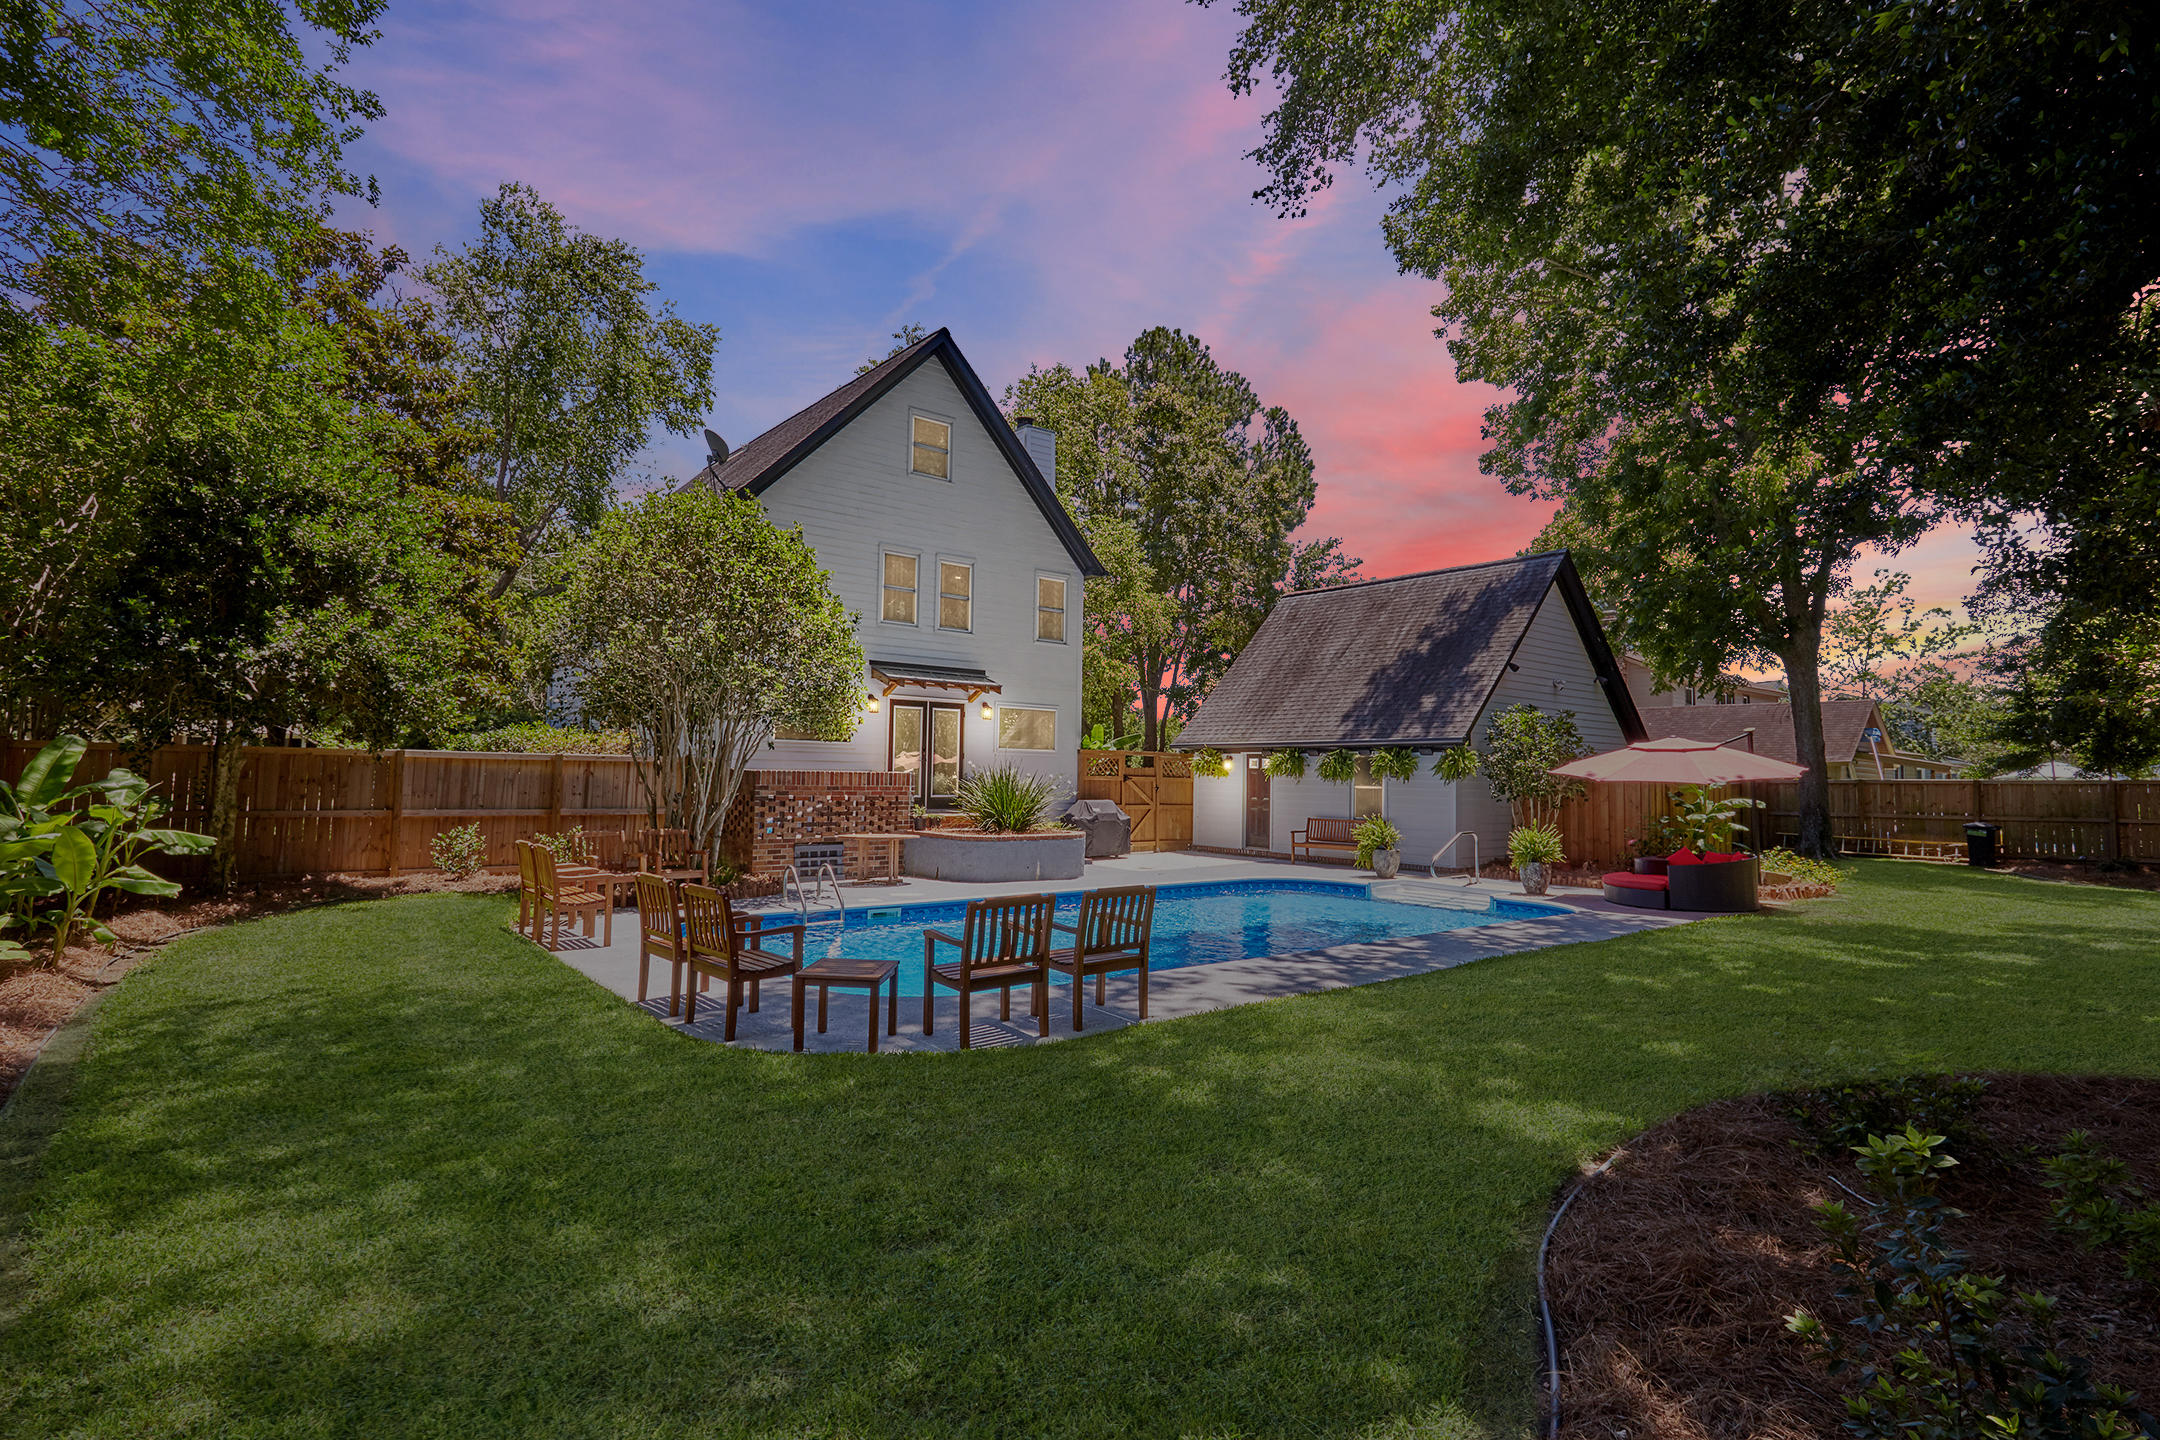 Stiles Point Plantation Homes For Sale - 699 Castle Pinckney, Charleston, SC - 1